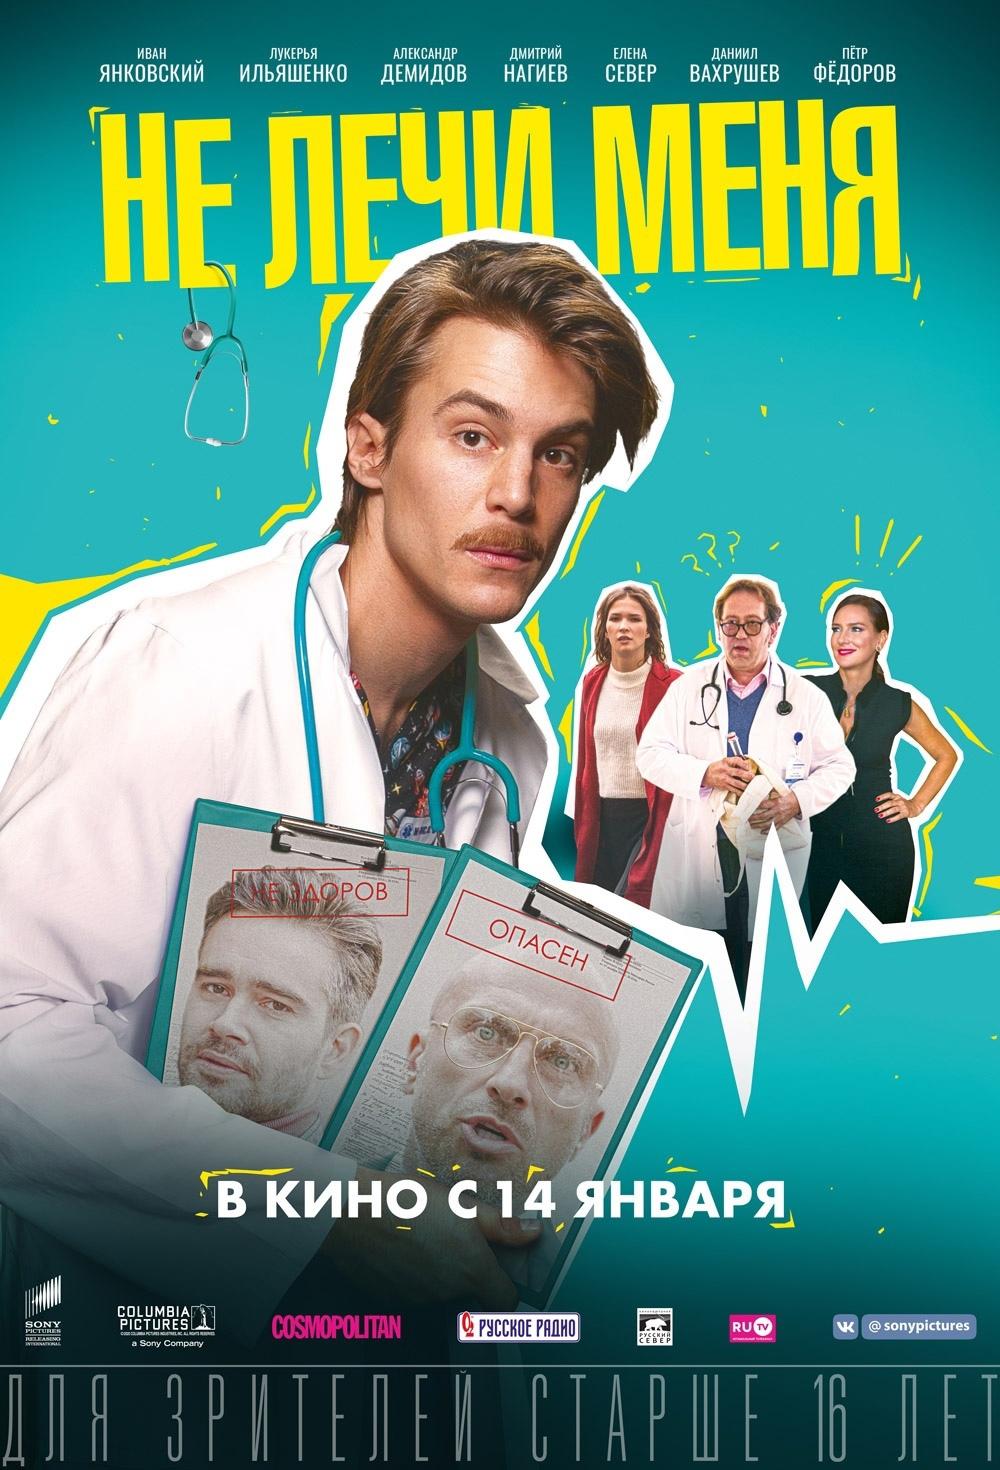 Комедия «He лeчи мeня» (2021) HD